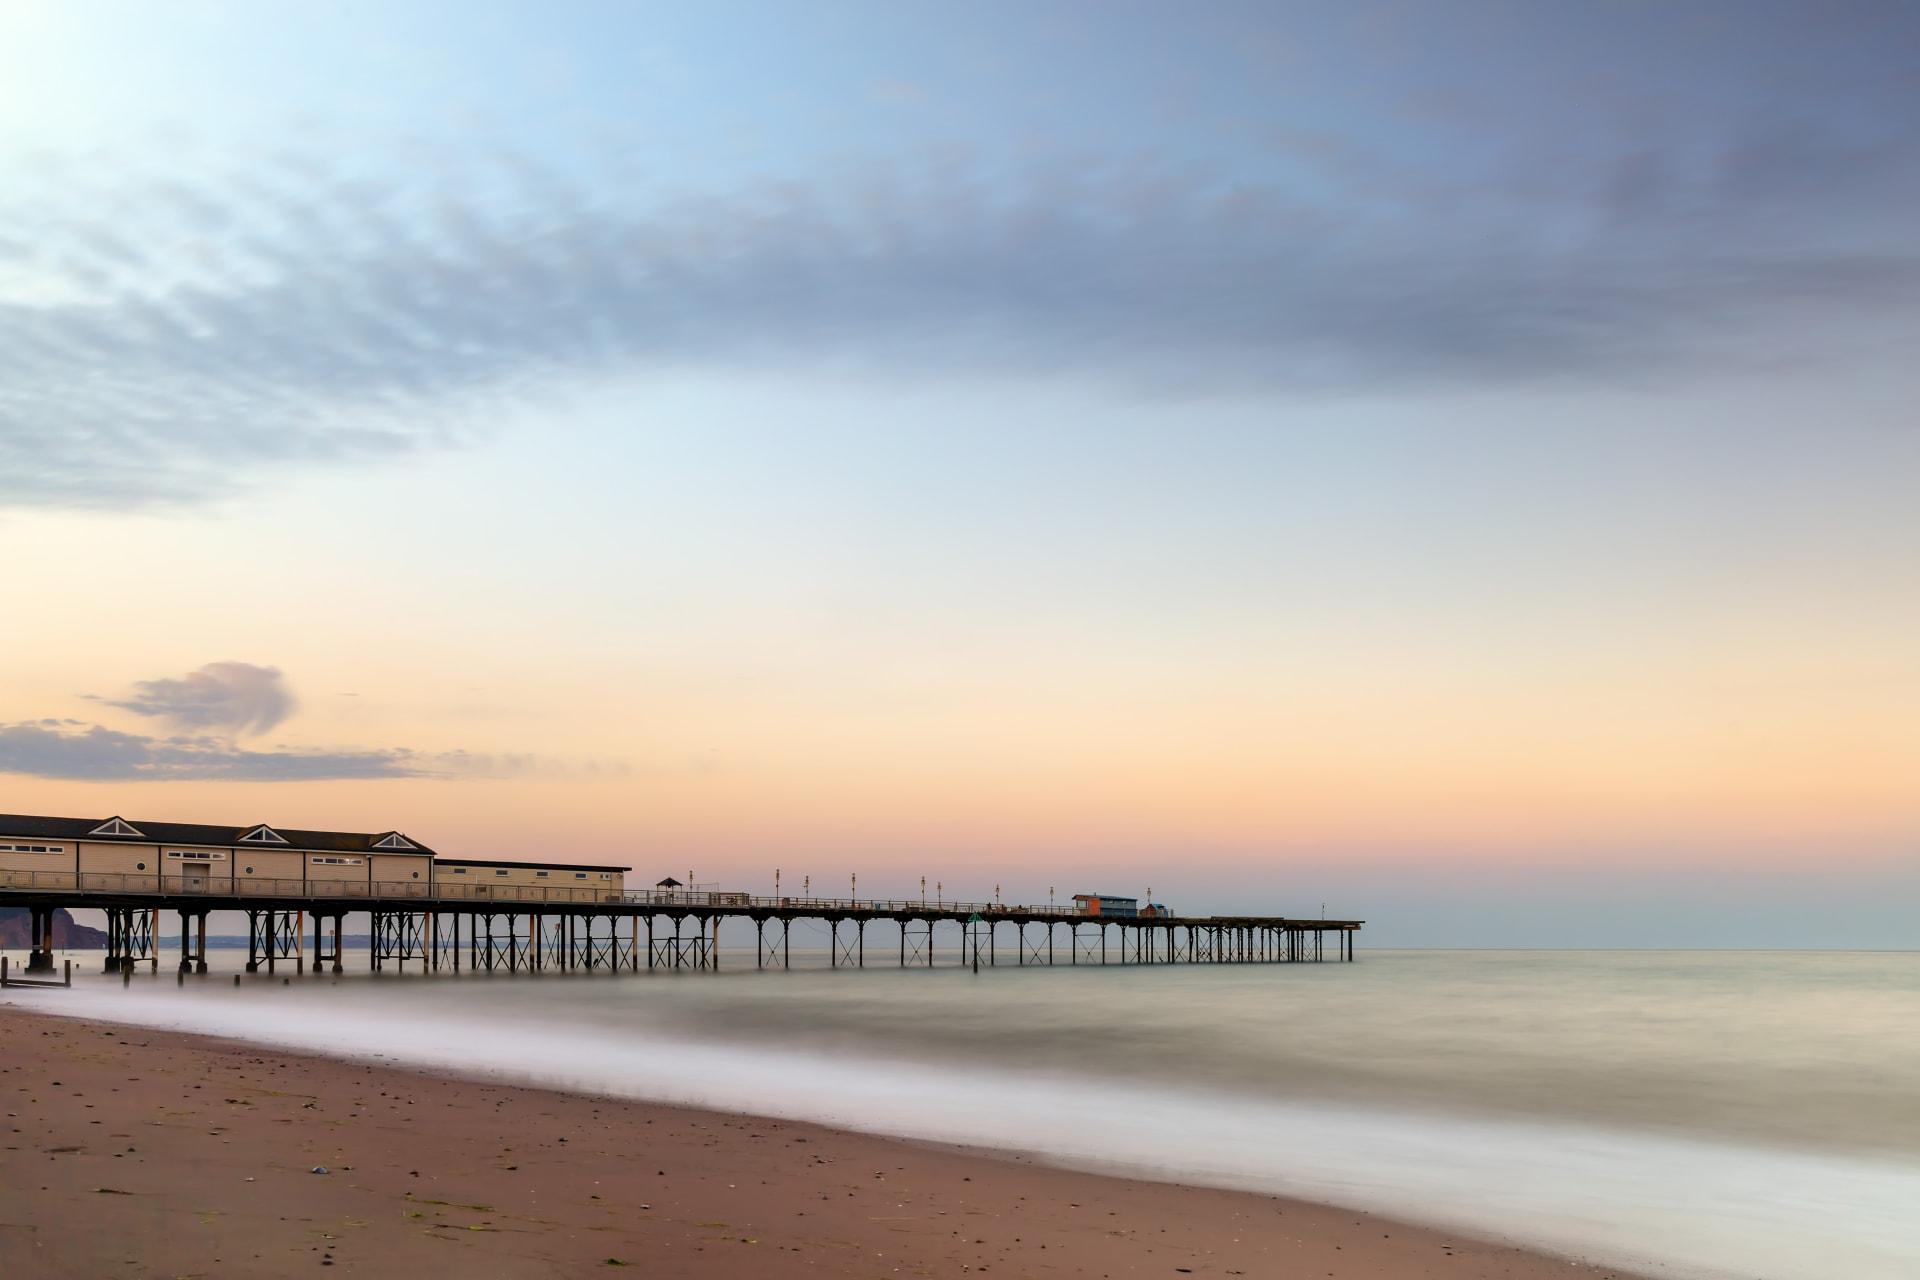 Devon - Teignmouth: eco-art seaside town with red sand beach (Silent Tour)